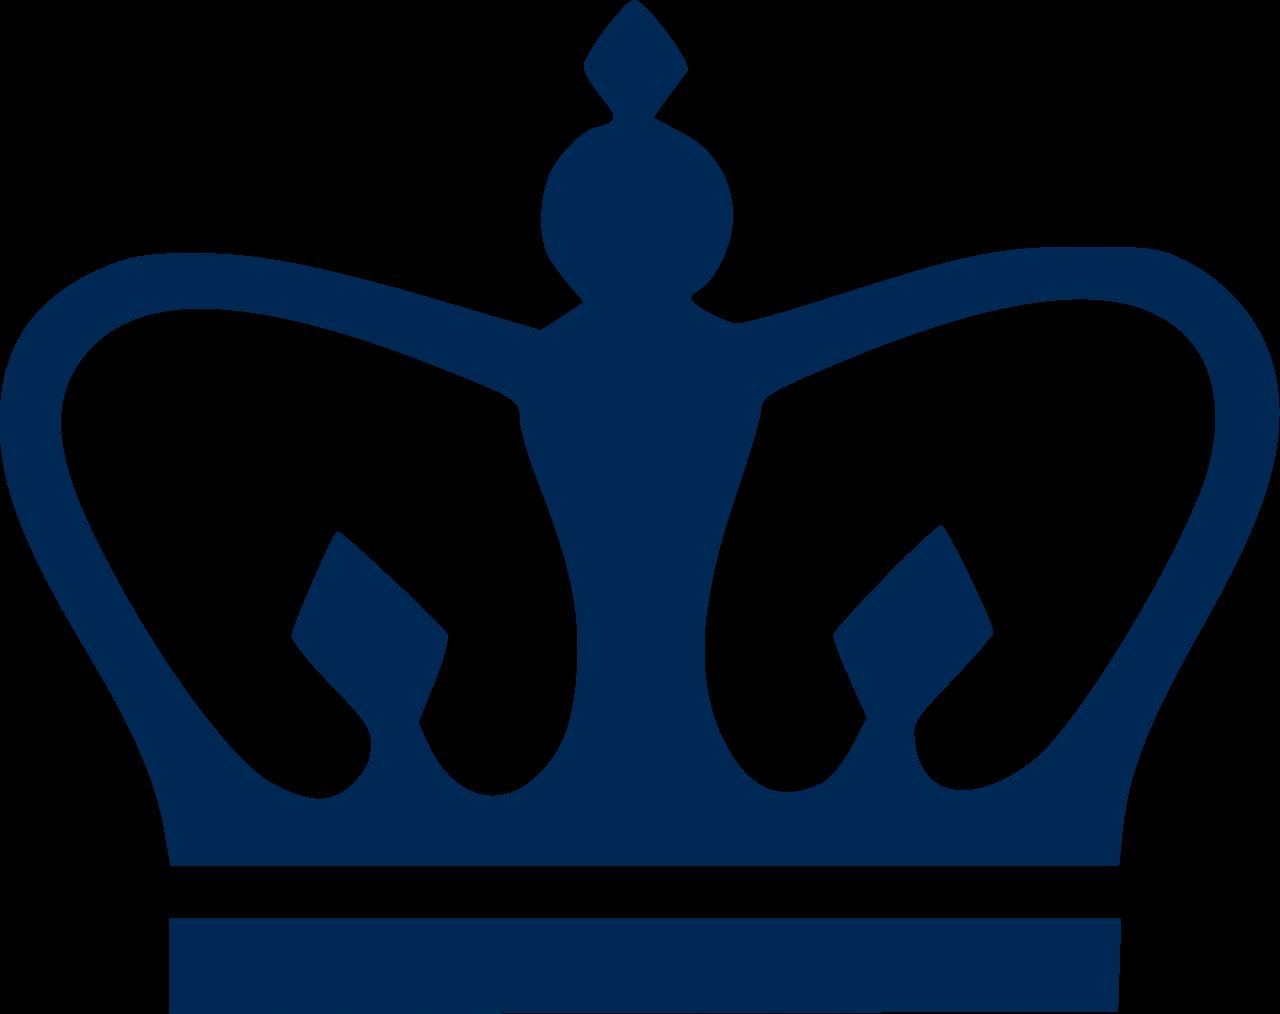 1280x1014 Filecolumbia Crown Simple.svg